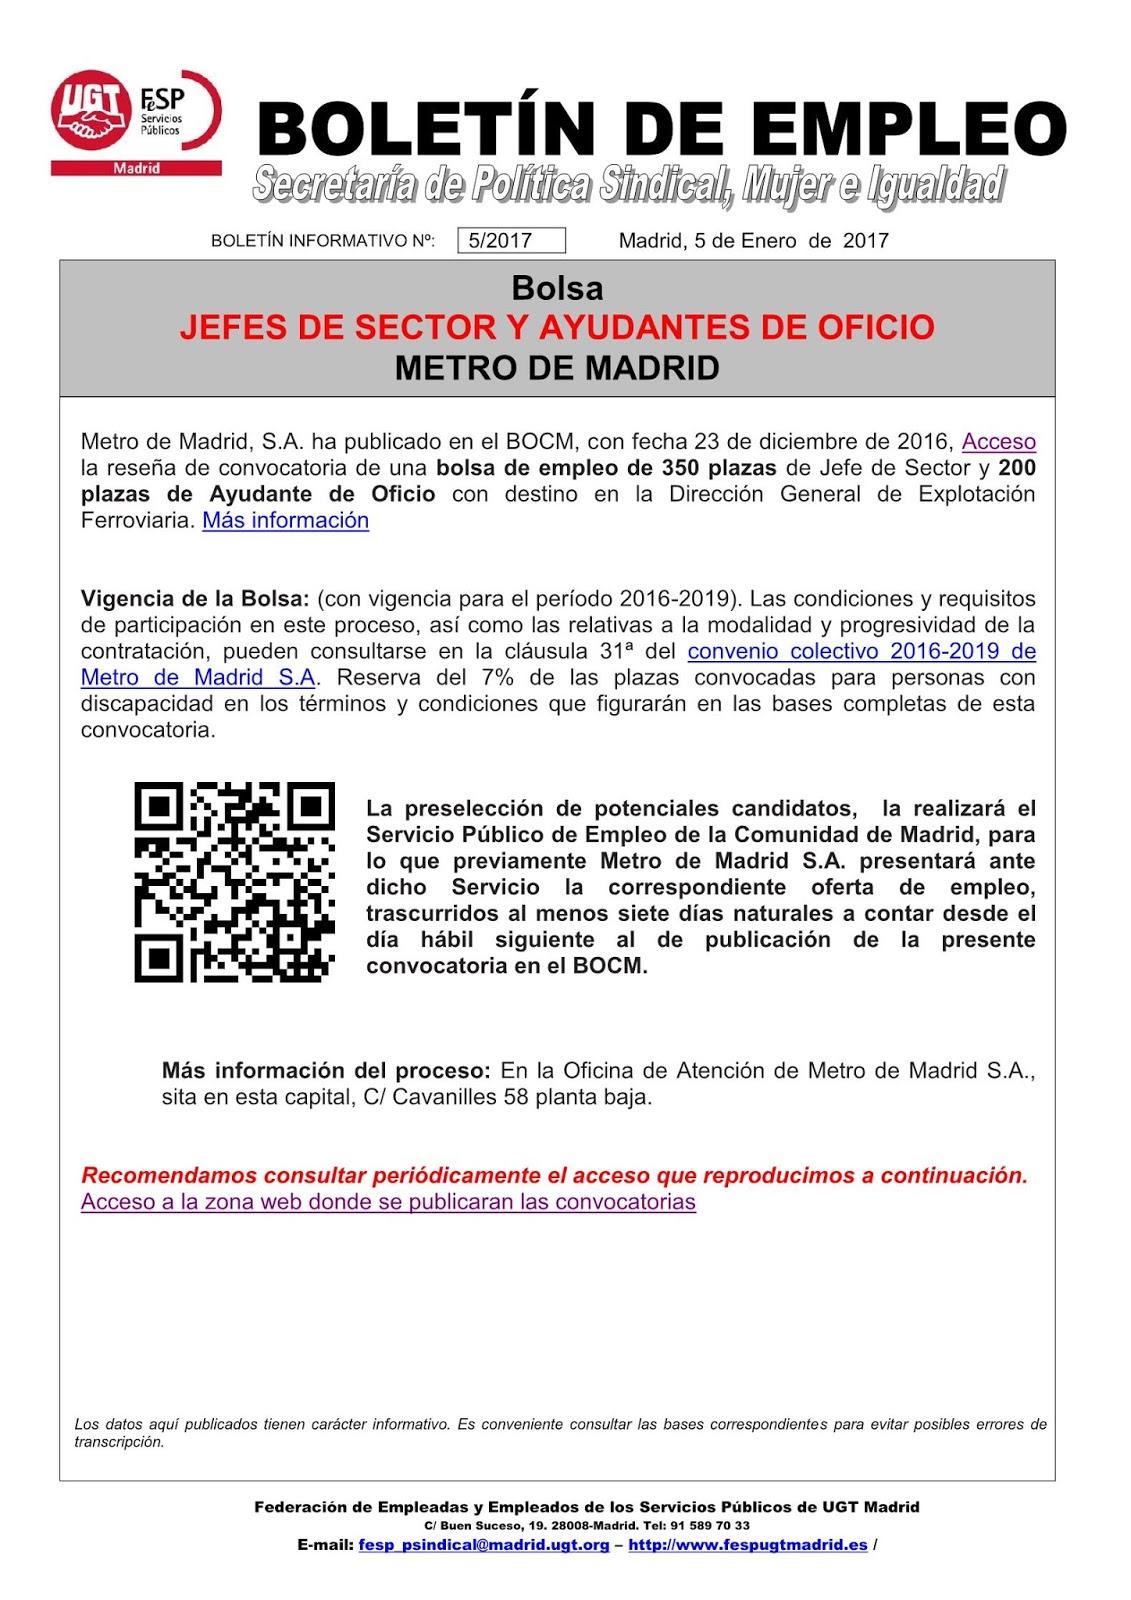 Ugt mara on ofertas de empleo - Ofertas de empleo madrid ...